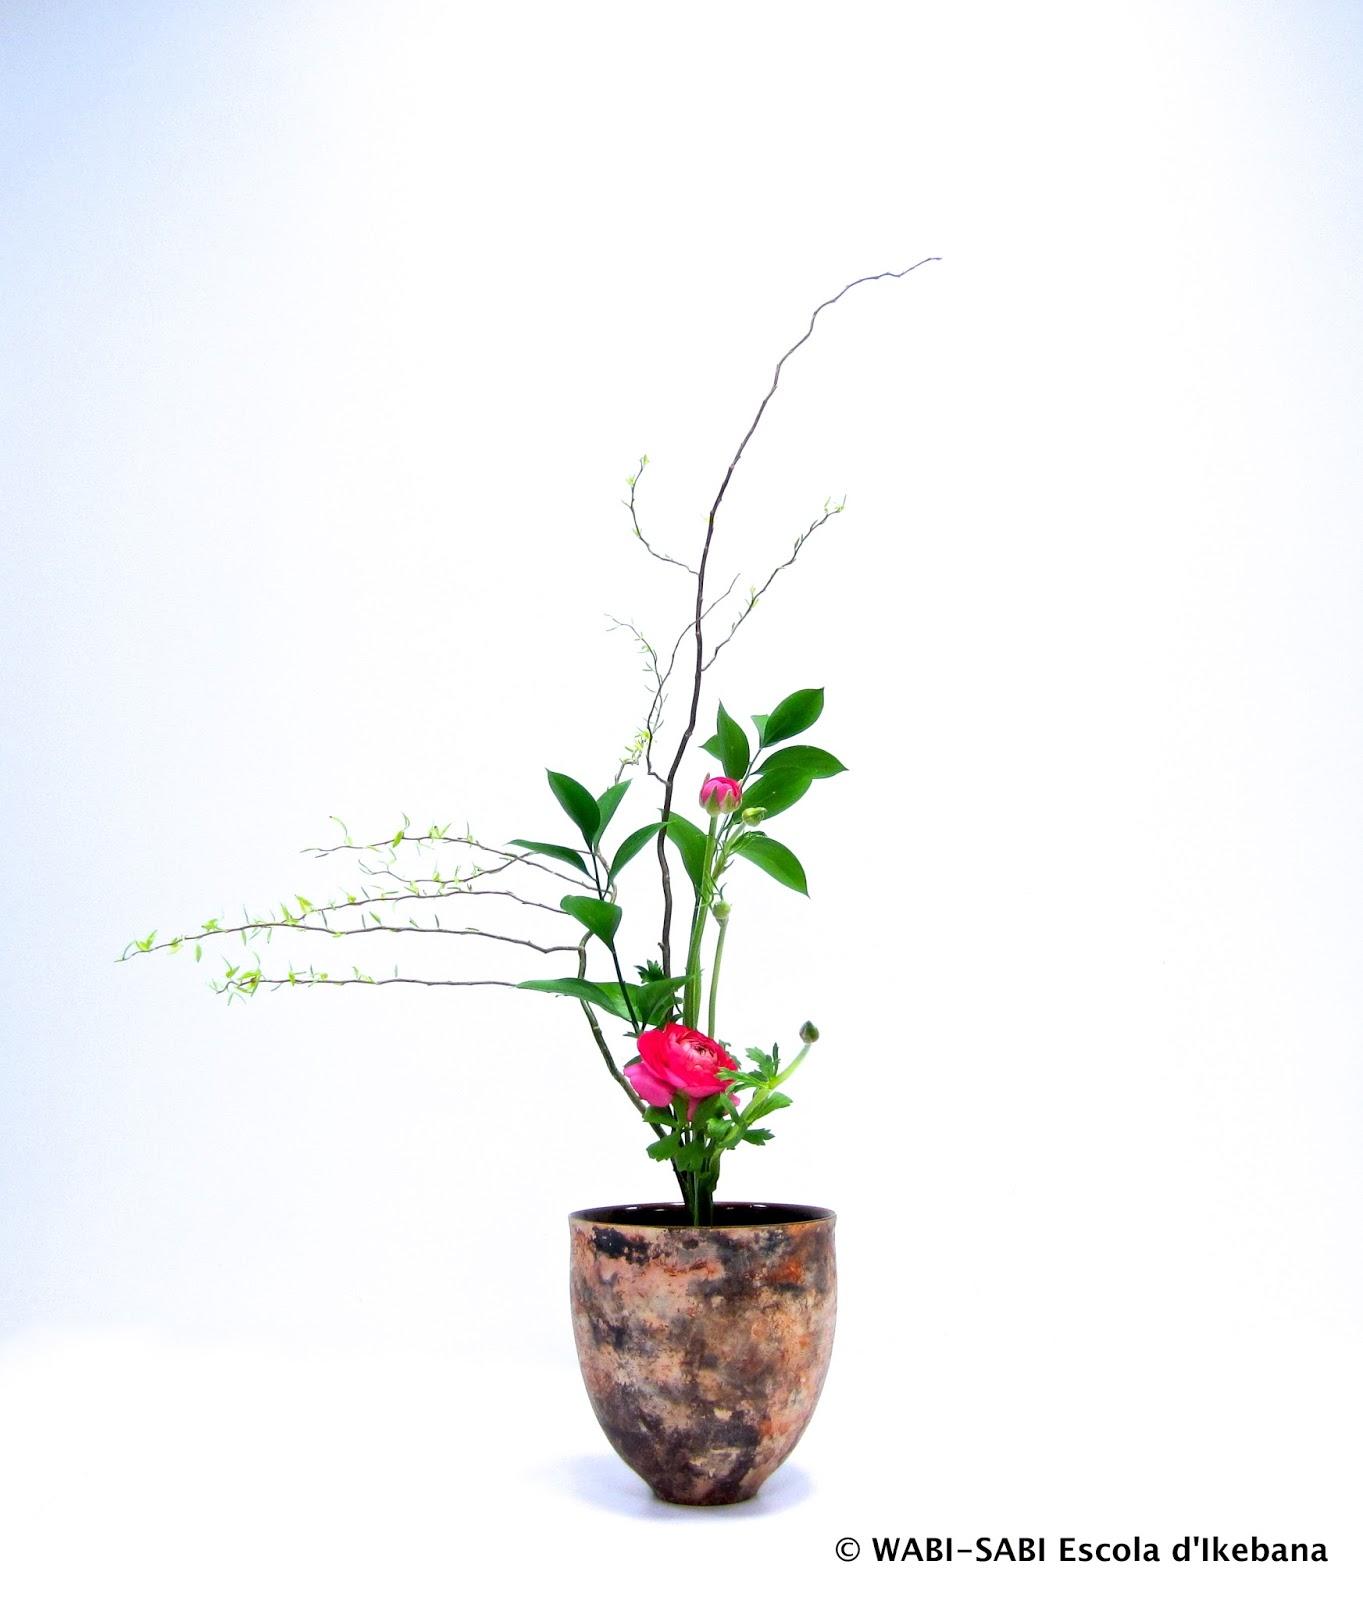 Ikebana-shoka shofutai-sanshuike